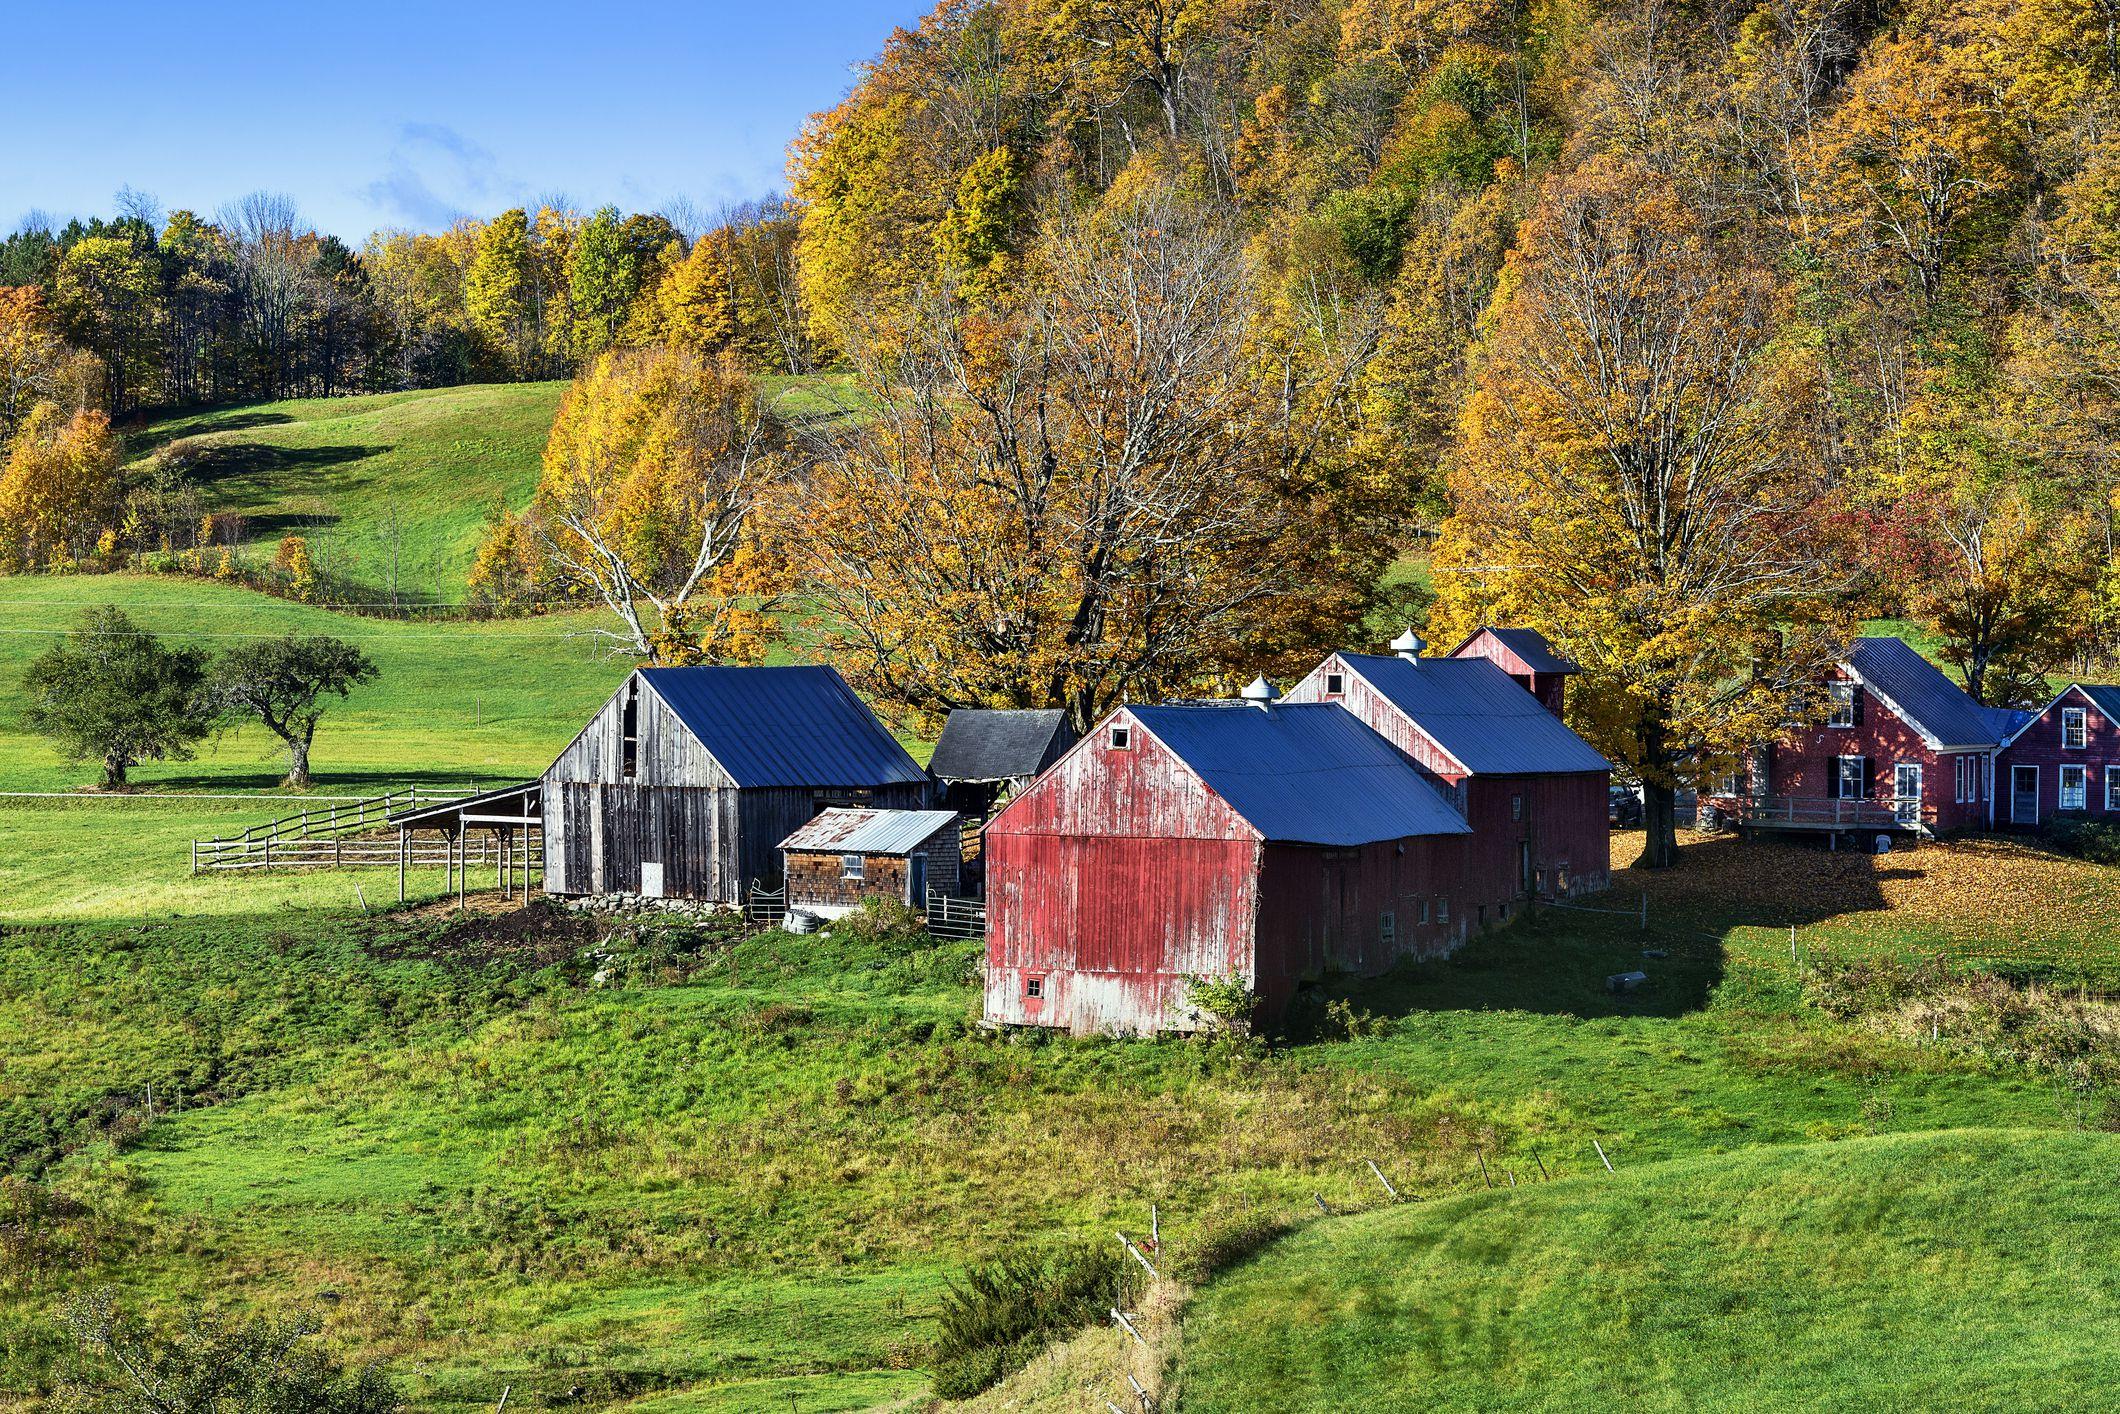 Jenne Farm in the autumn